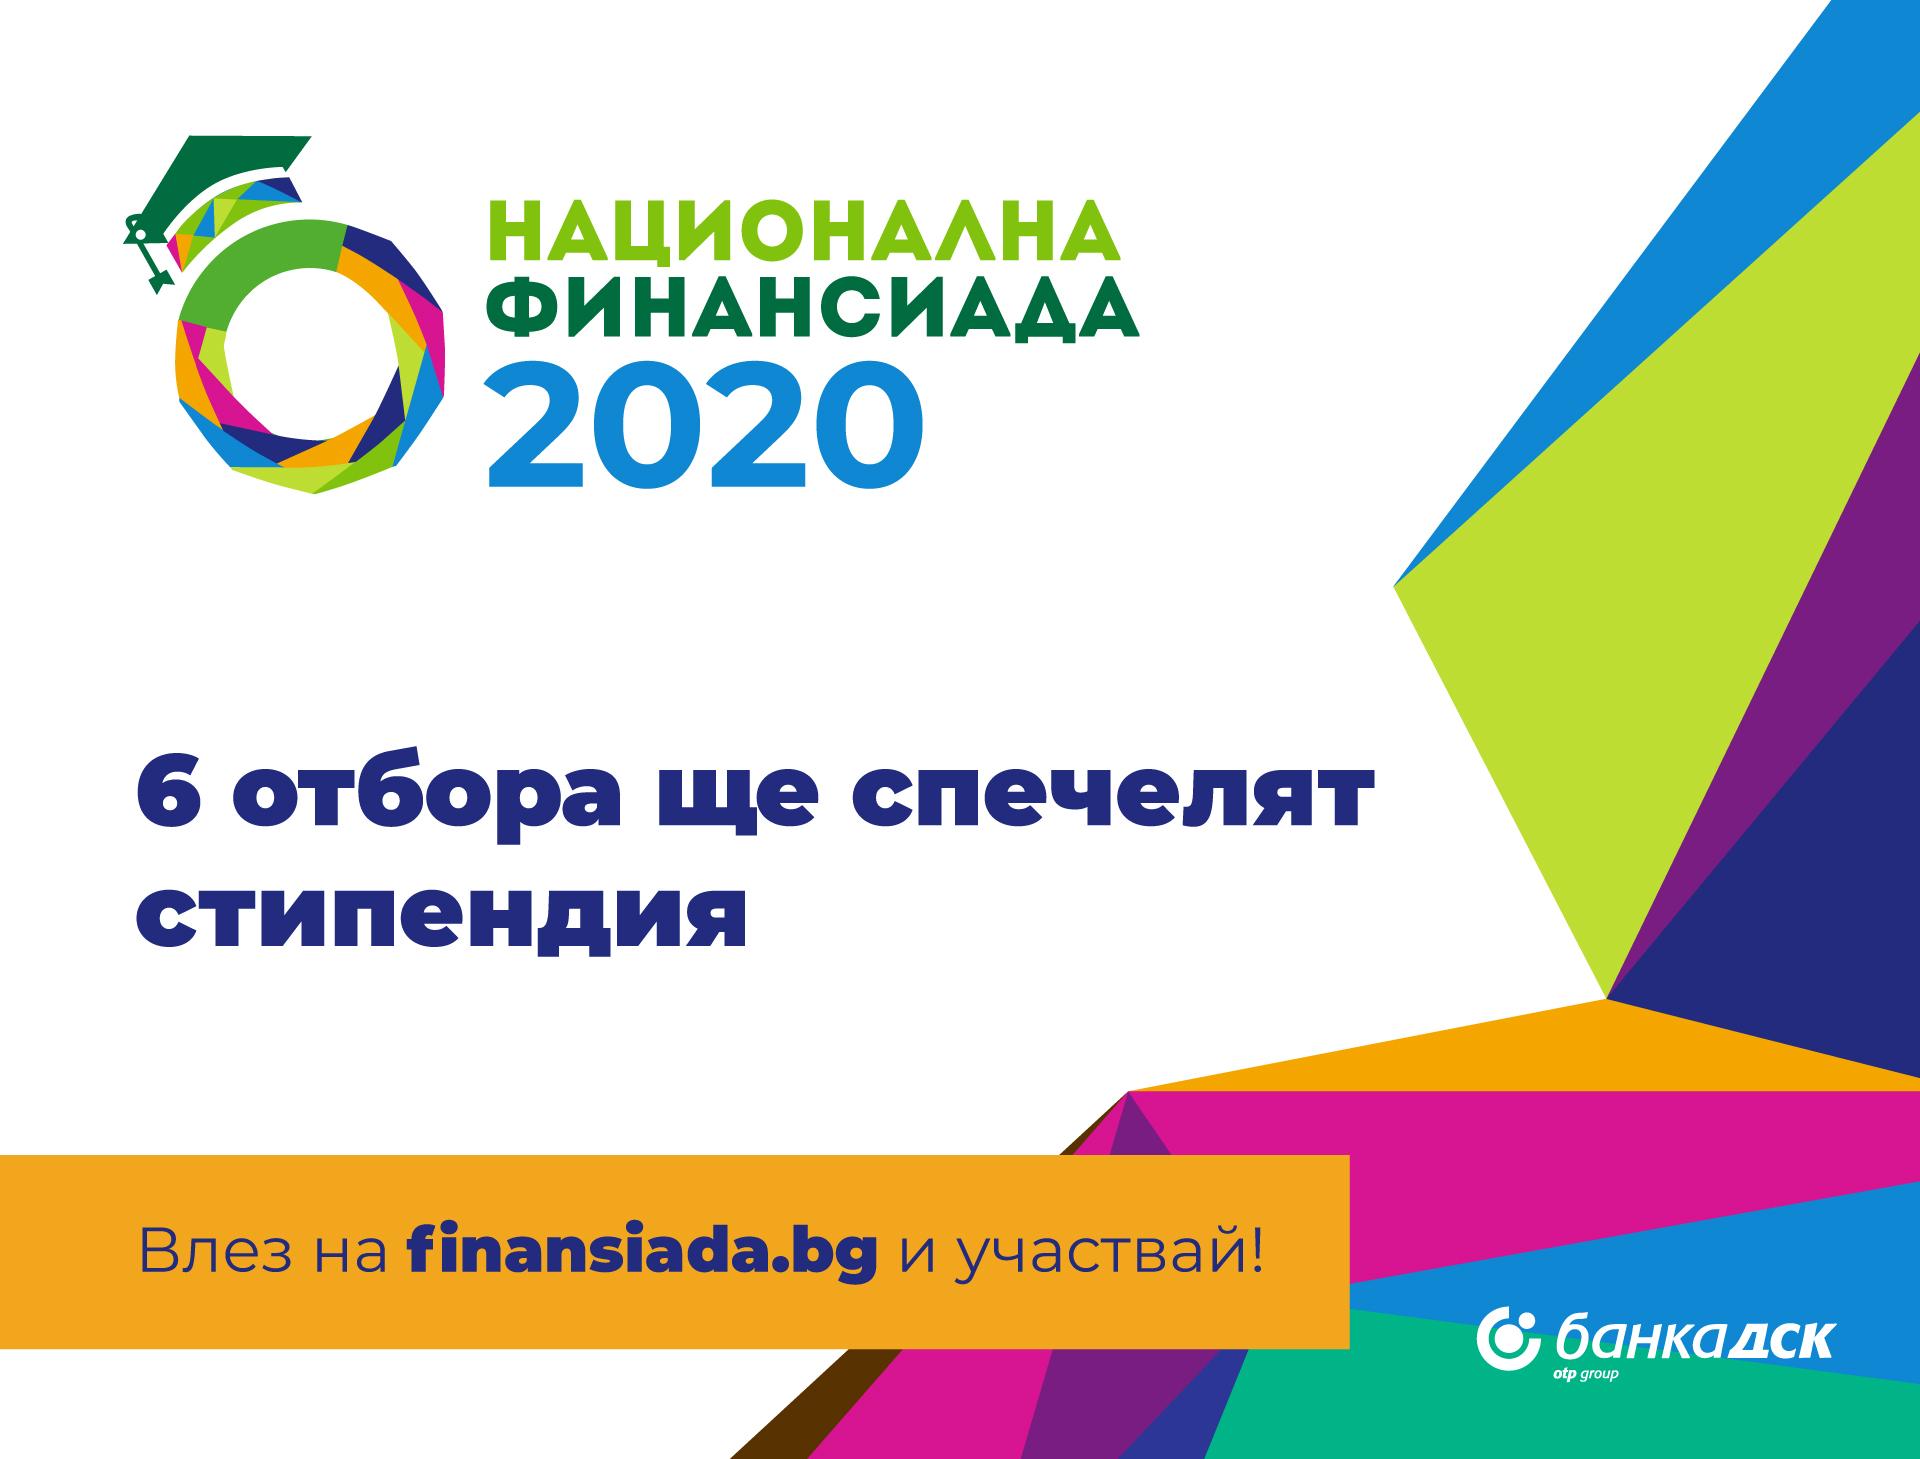 DSK Bank_Financial Olympics 2020